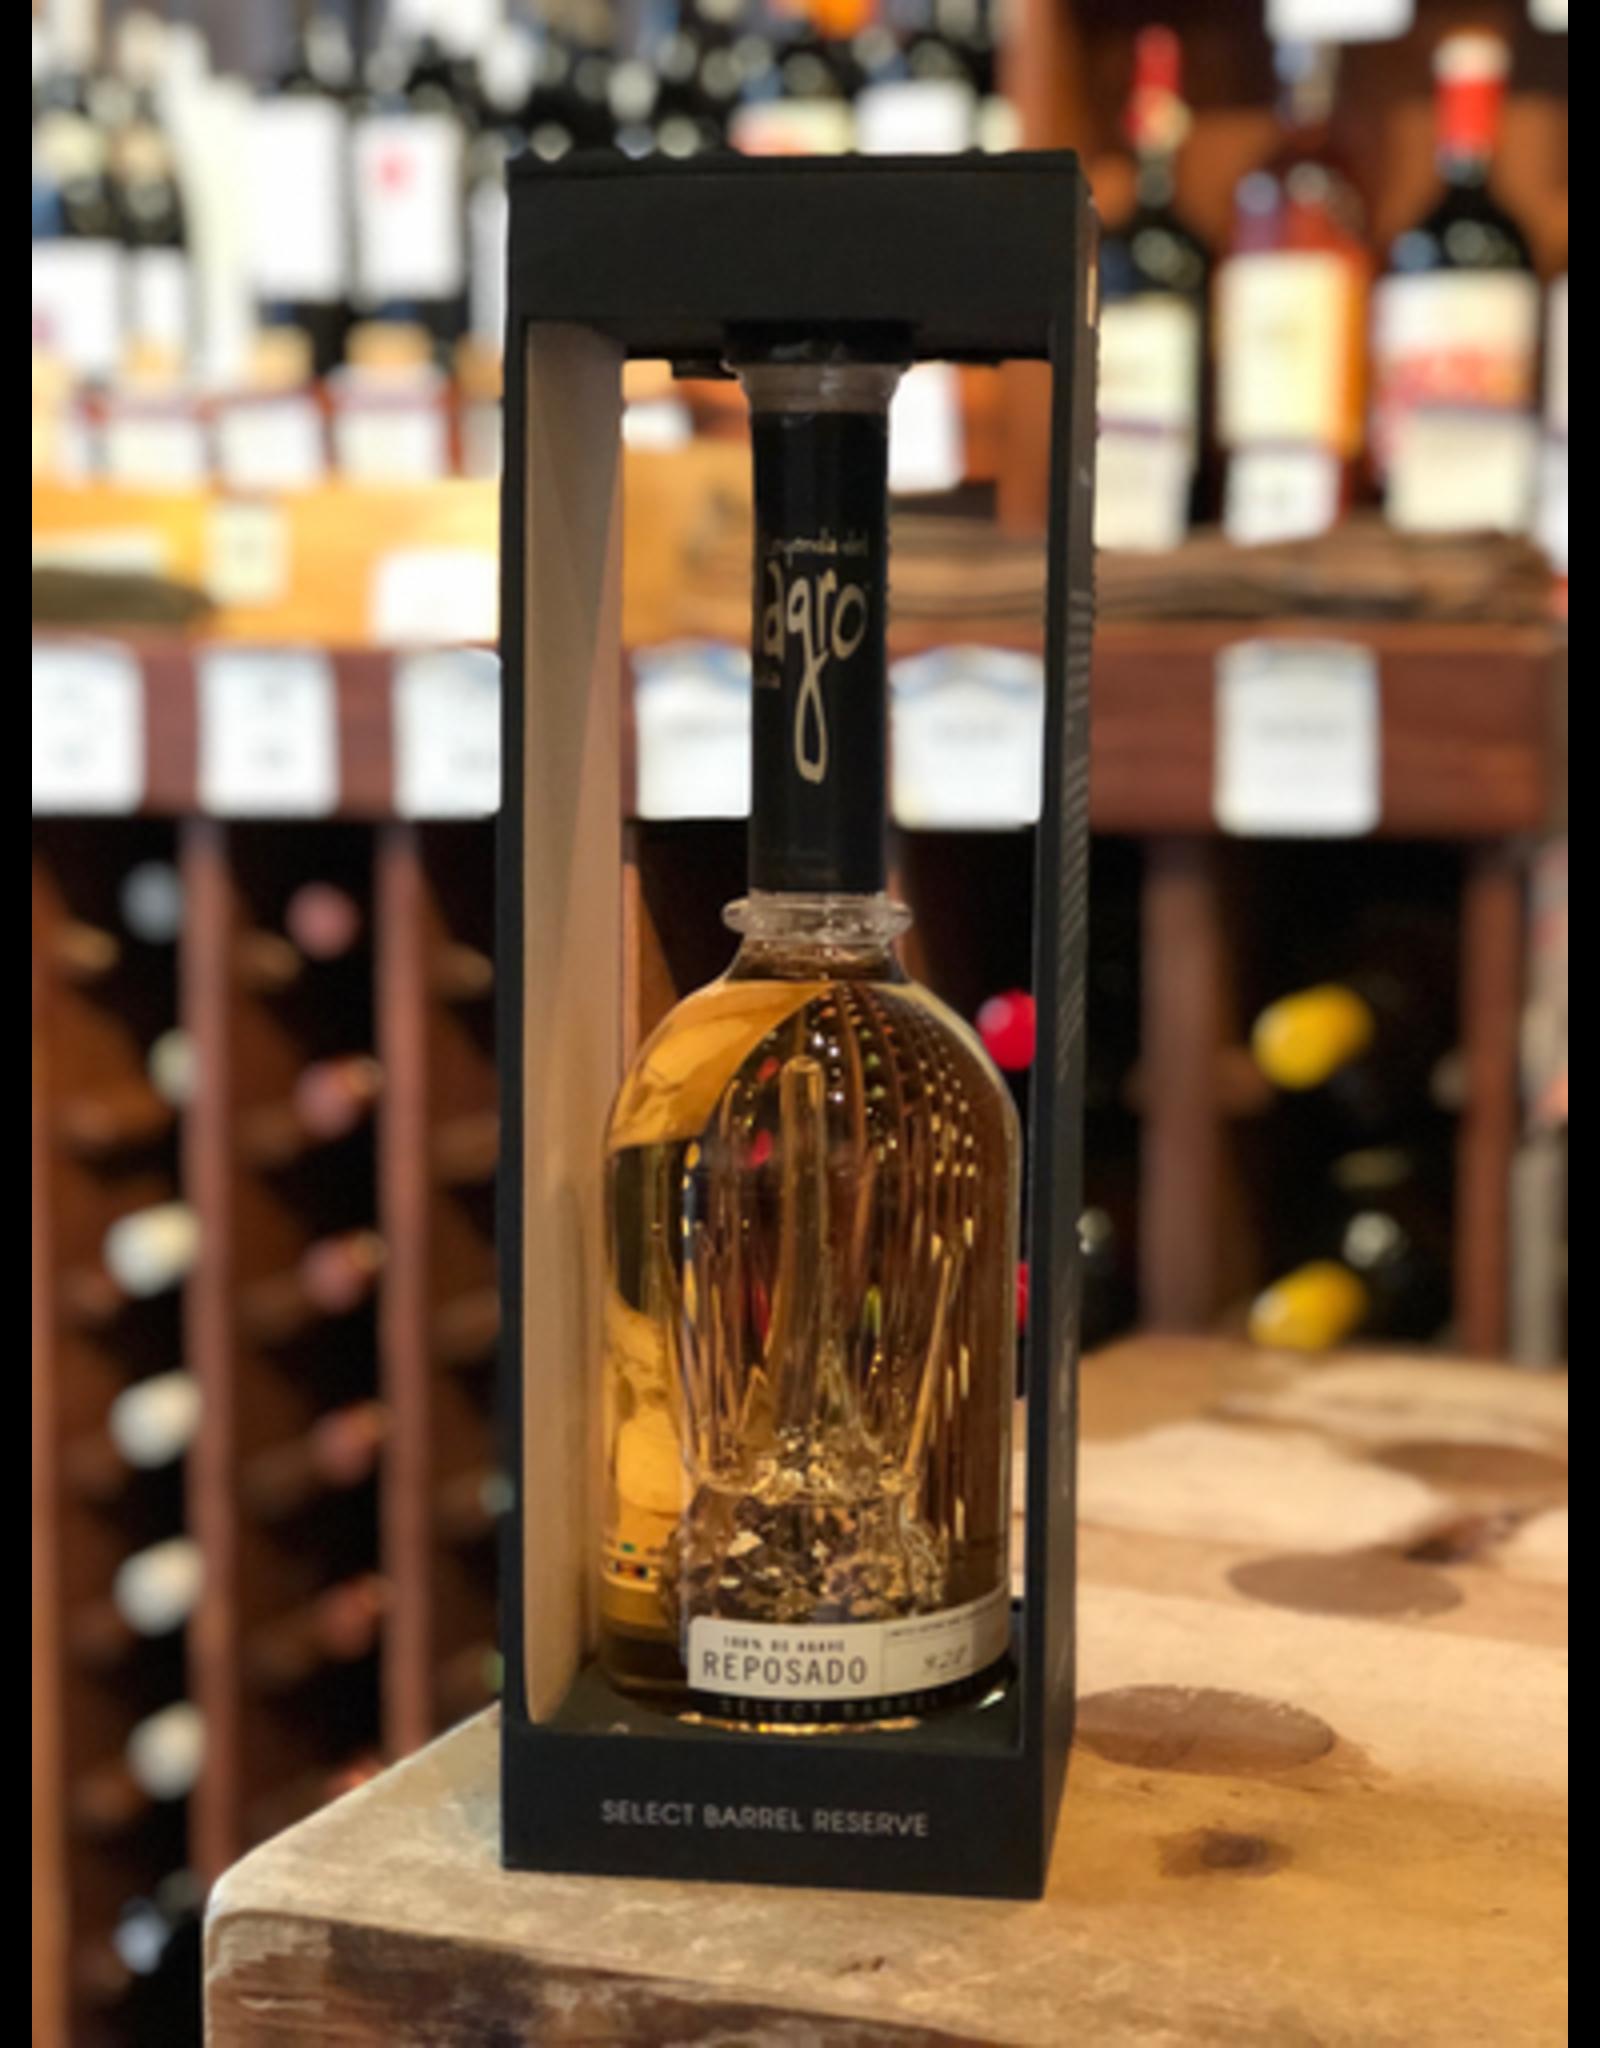 Milagro Tequila Select Barrel Reserve Reposado - Jalisco, Mexico (750ml)